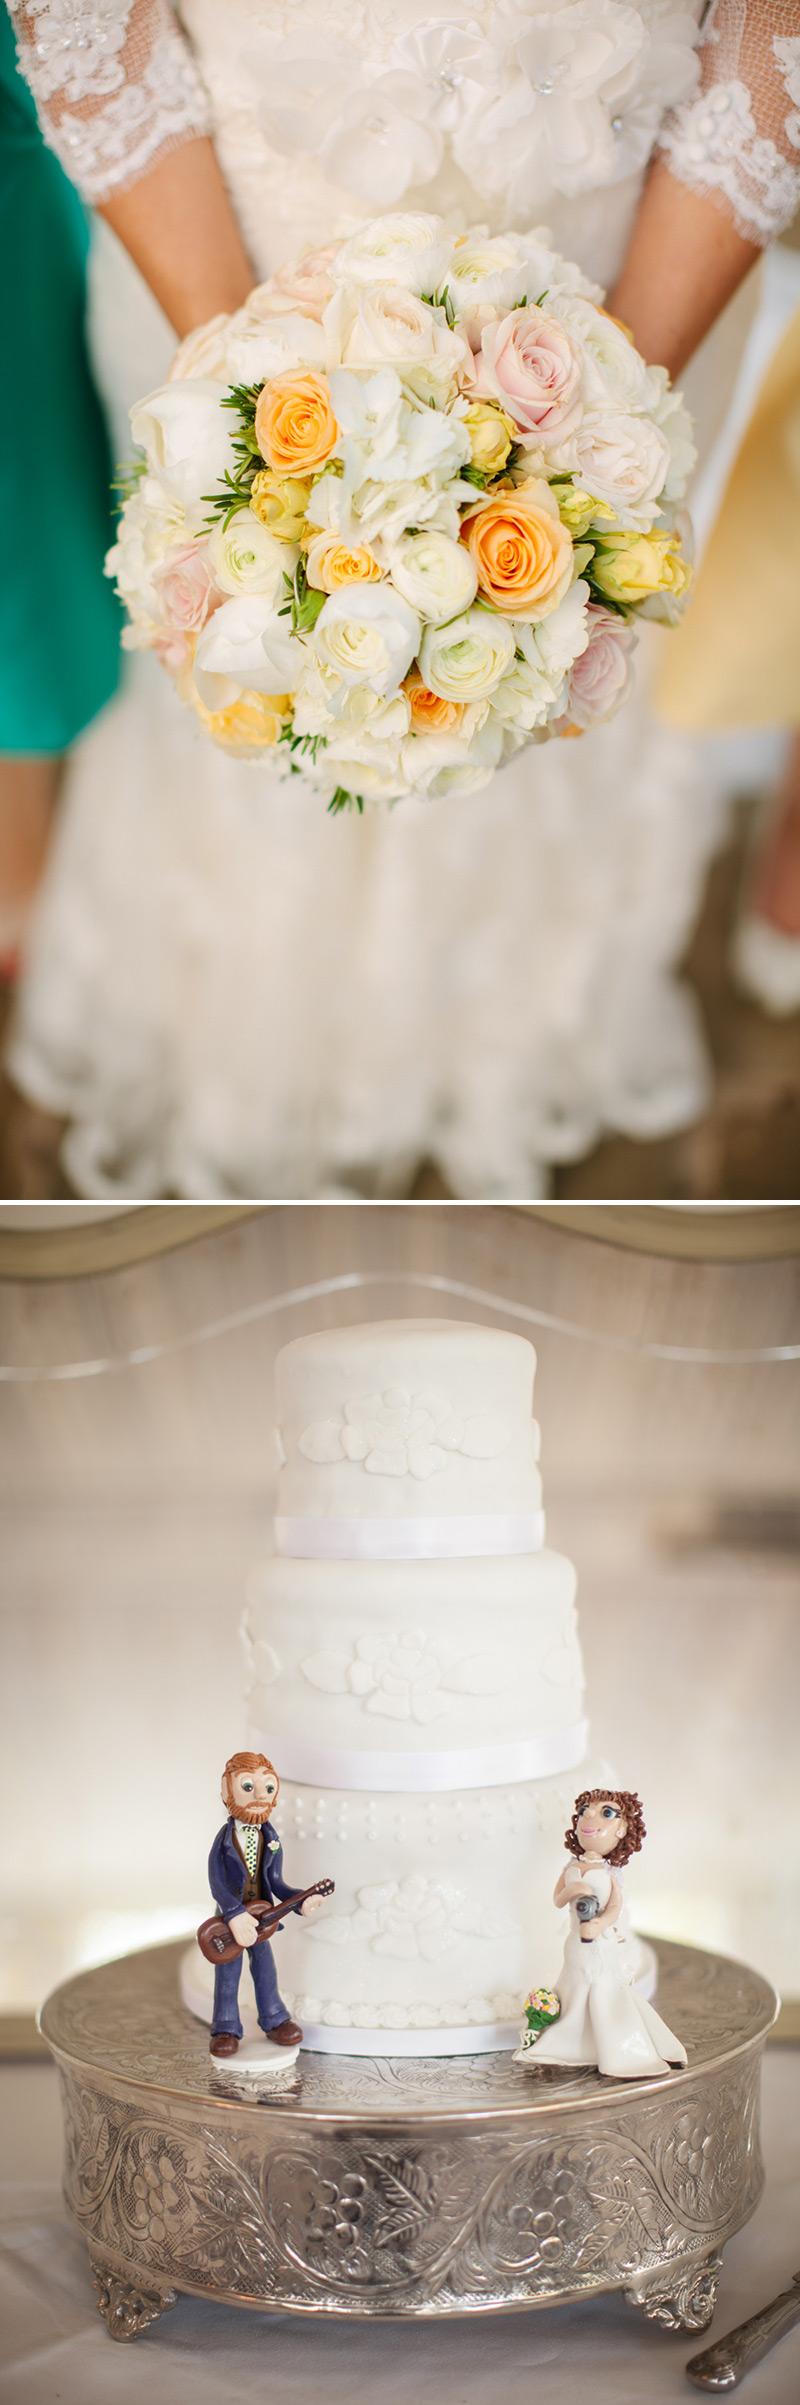 The Wedding Club Archives - ROCK MY WEDDING | UK WEDDING BLOG ...